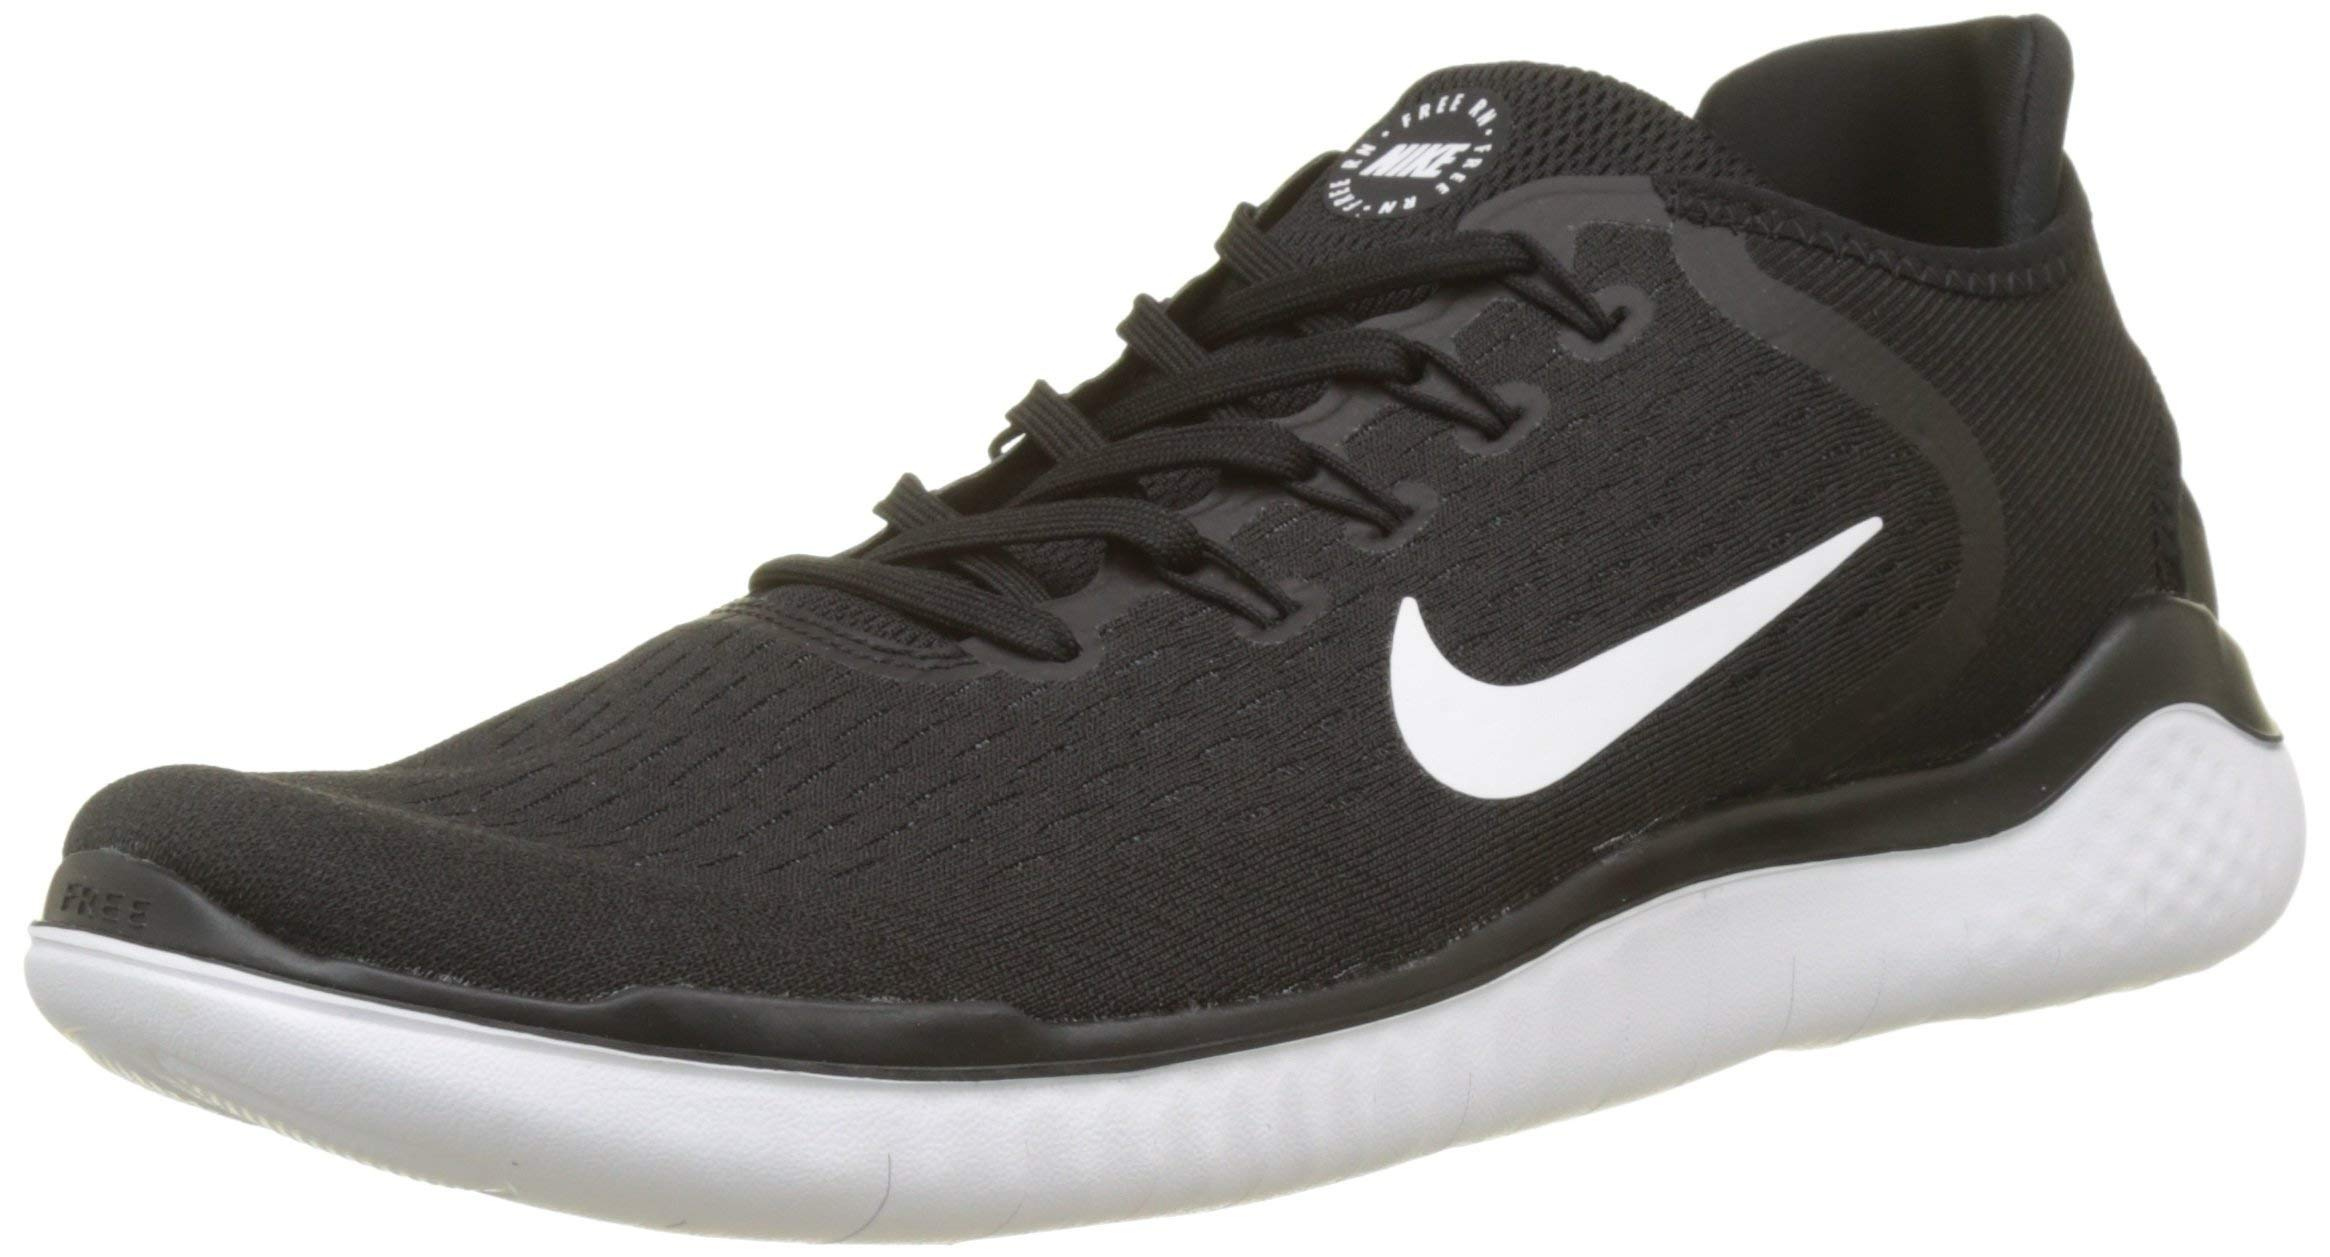 acab6aaca0e0 Galleon - Nike Men s Free RN 2018 Nylon Running Shoes 11 Black White